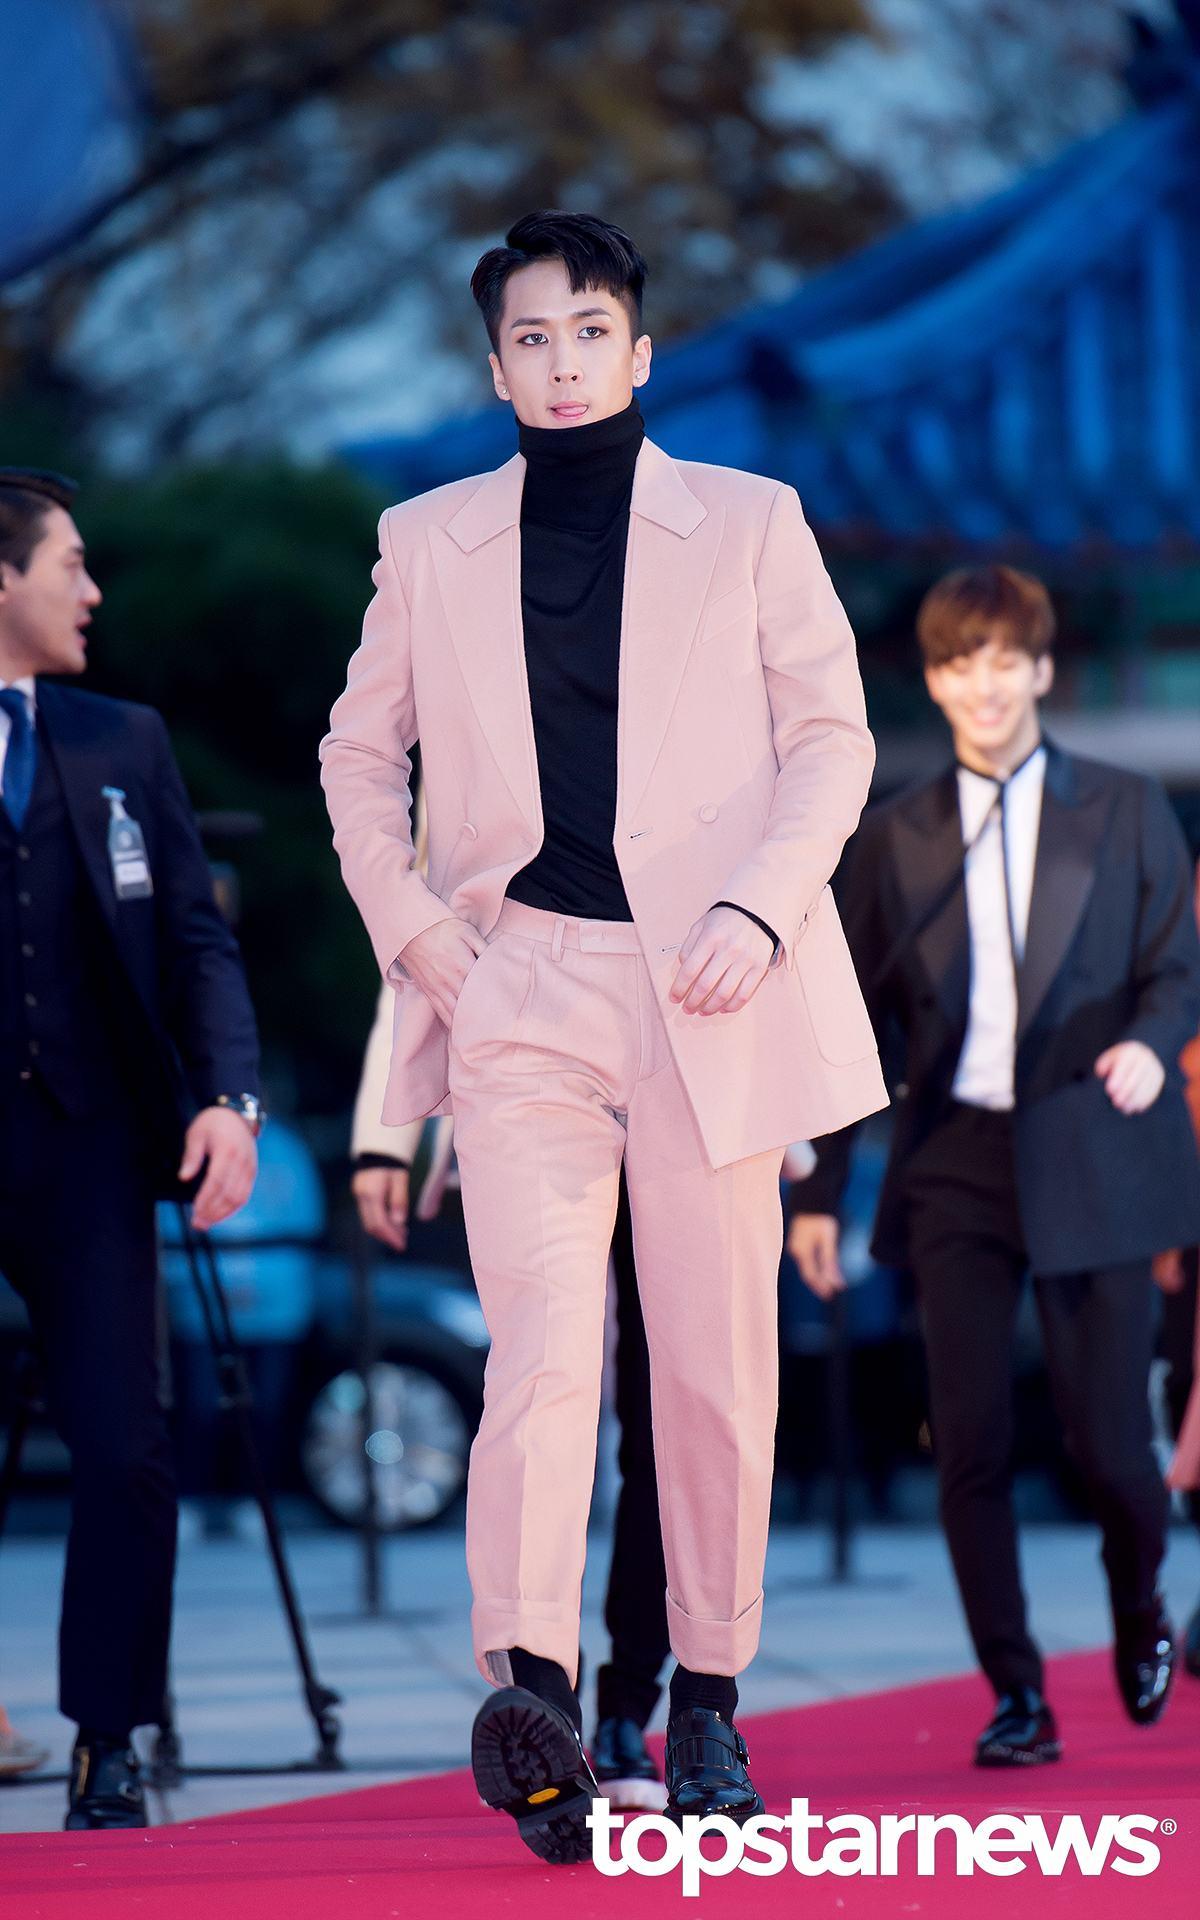 VIXX的Ravi才是符合當天氣溫的穿法啊!最近韓國傍晚都是接近3、4度的氣溫,難怪昨晚出席典禮的男偶像們每個都是大衣上身啊!